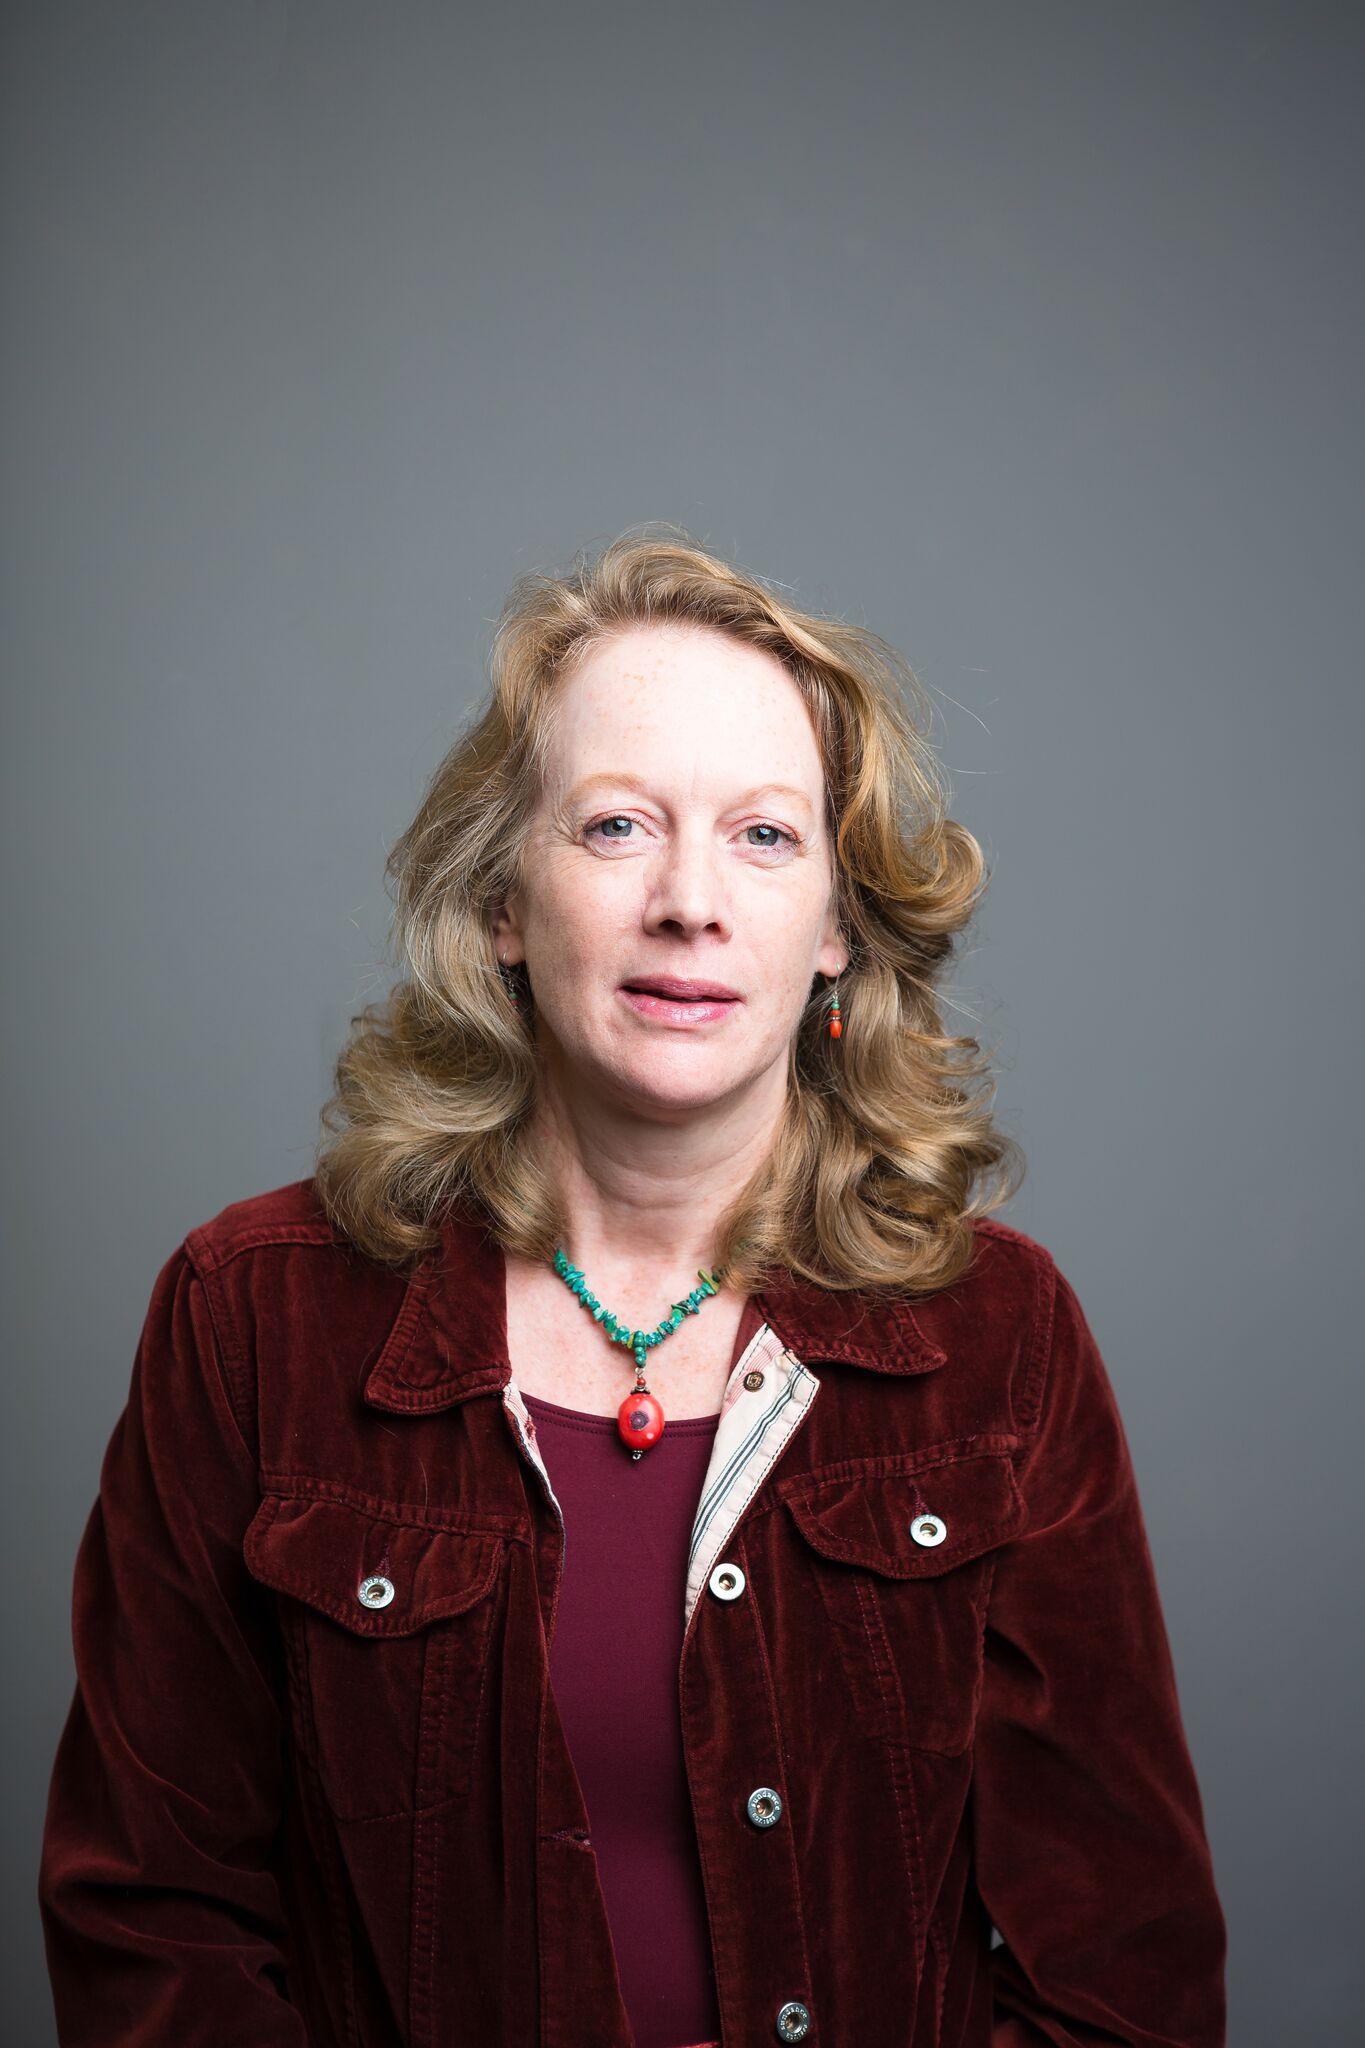 Nicola Waldron - literary artist  photo by Forrest Clonts